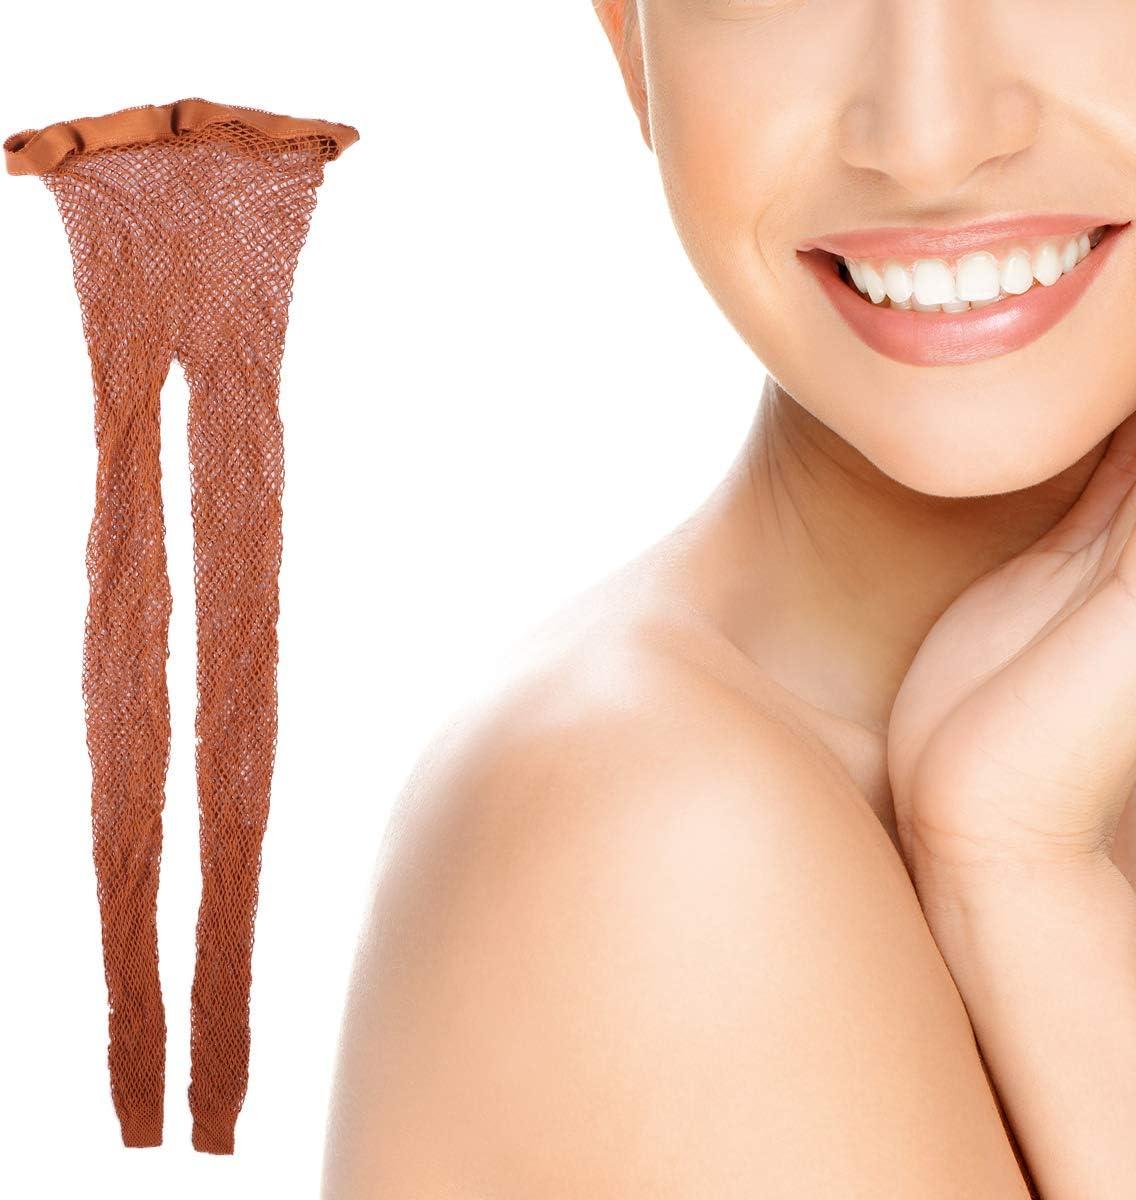 Caramel FENICAL Collants R/ésille Femmes Bas Collants Taille Moyenne Filet Moyen Trou